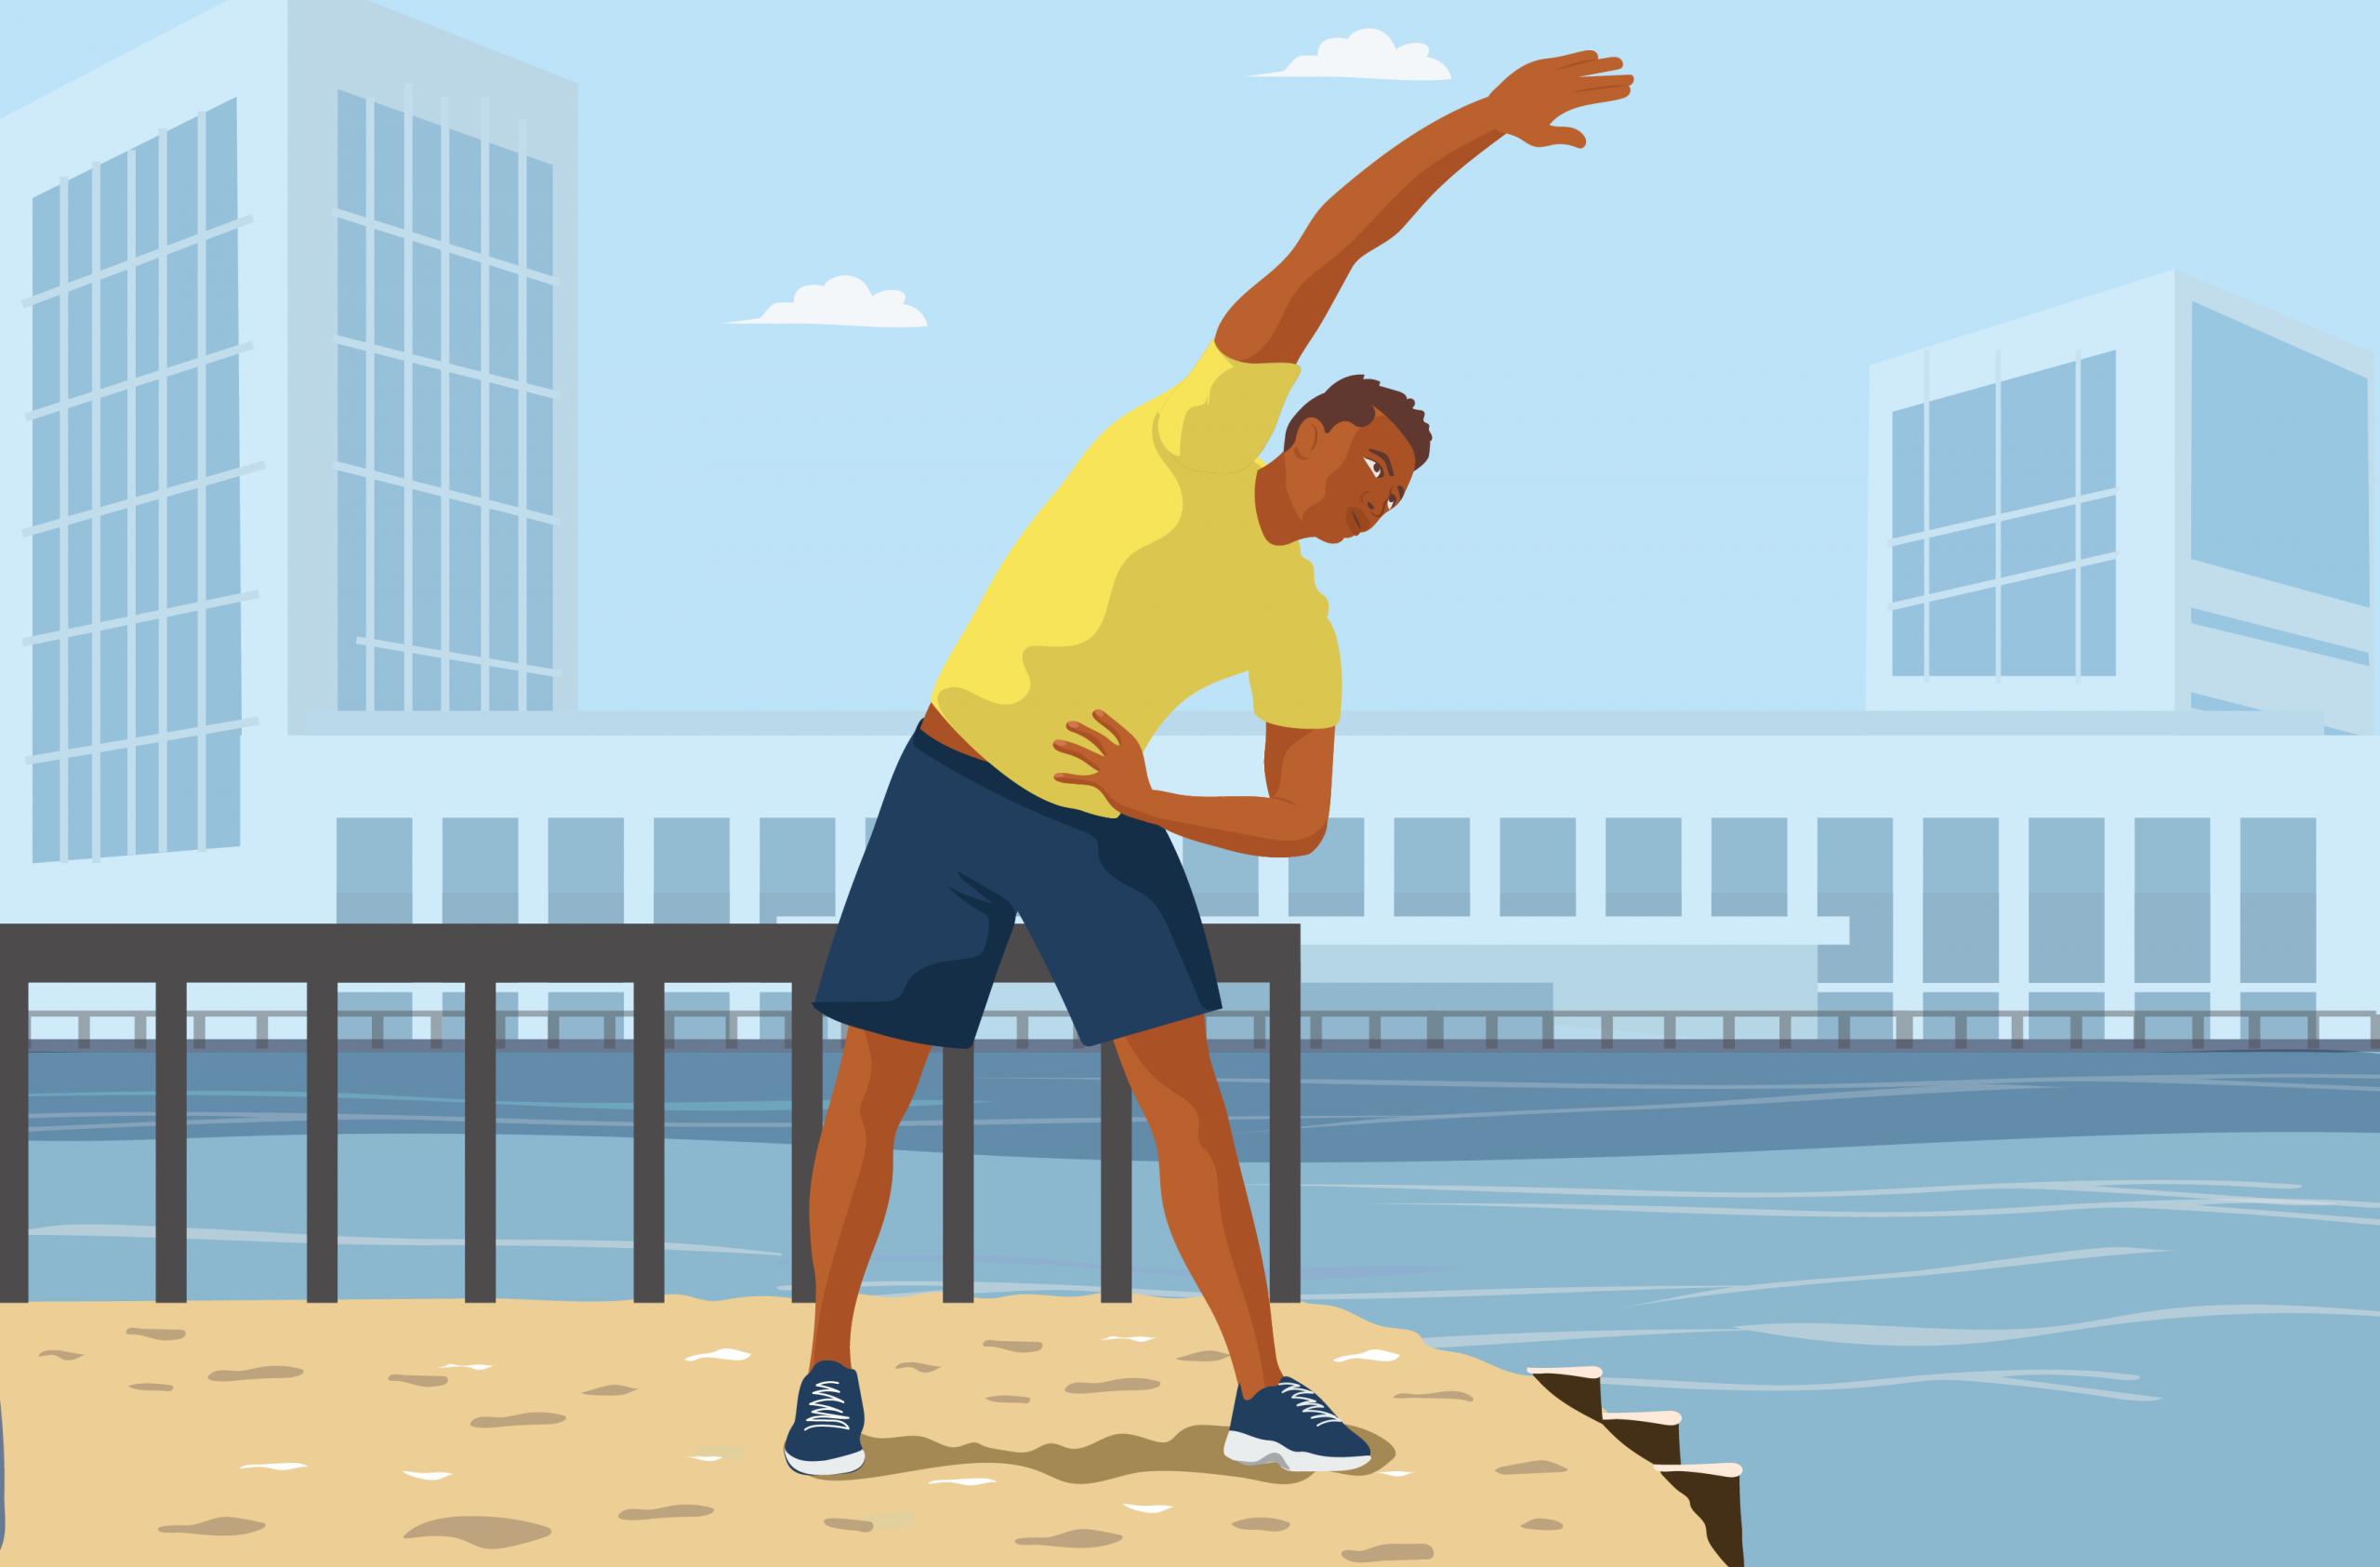 Aerobic Exercise Stimulates Learning and Memory